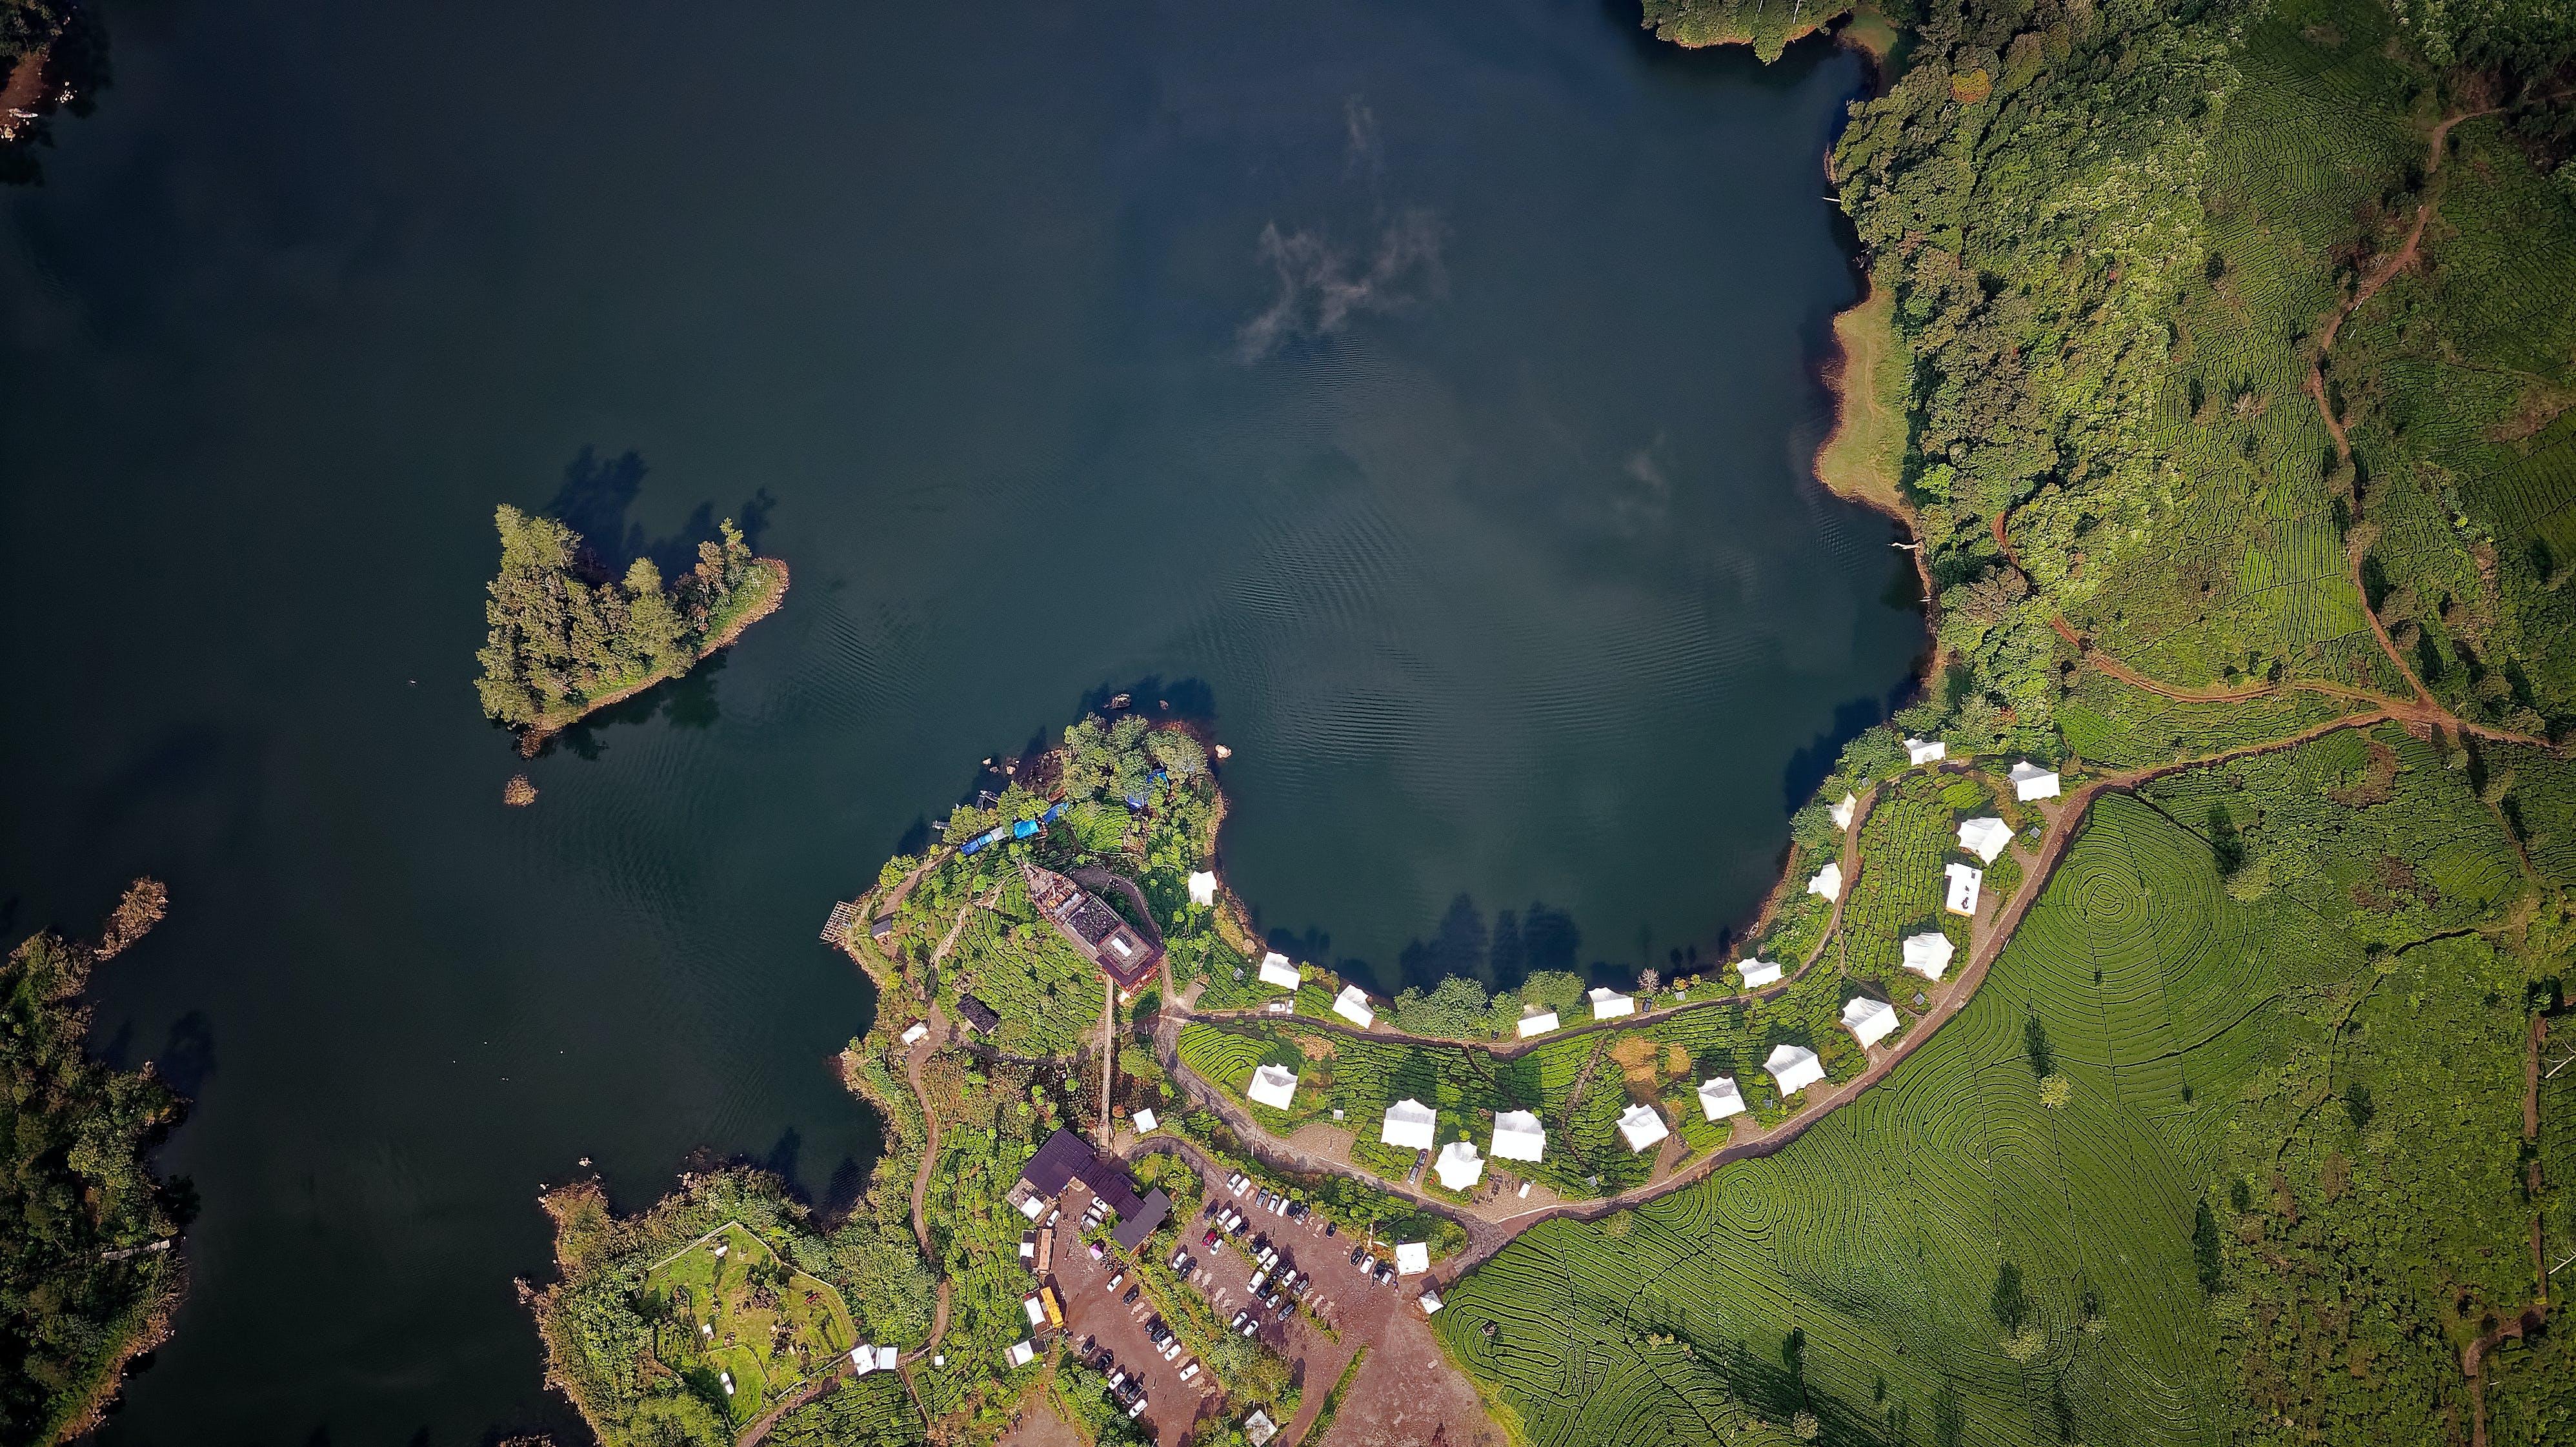 Aerial Photo of Green Island